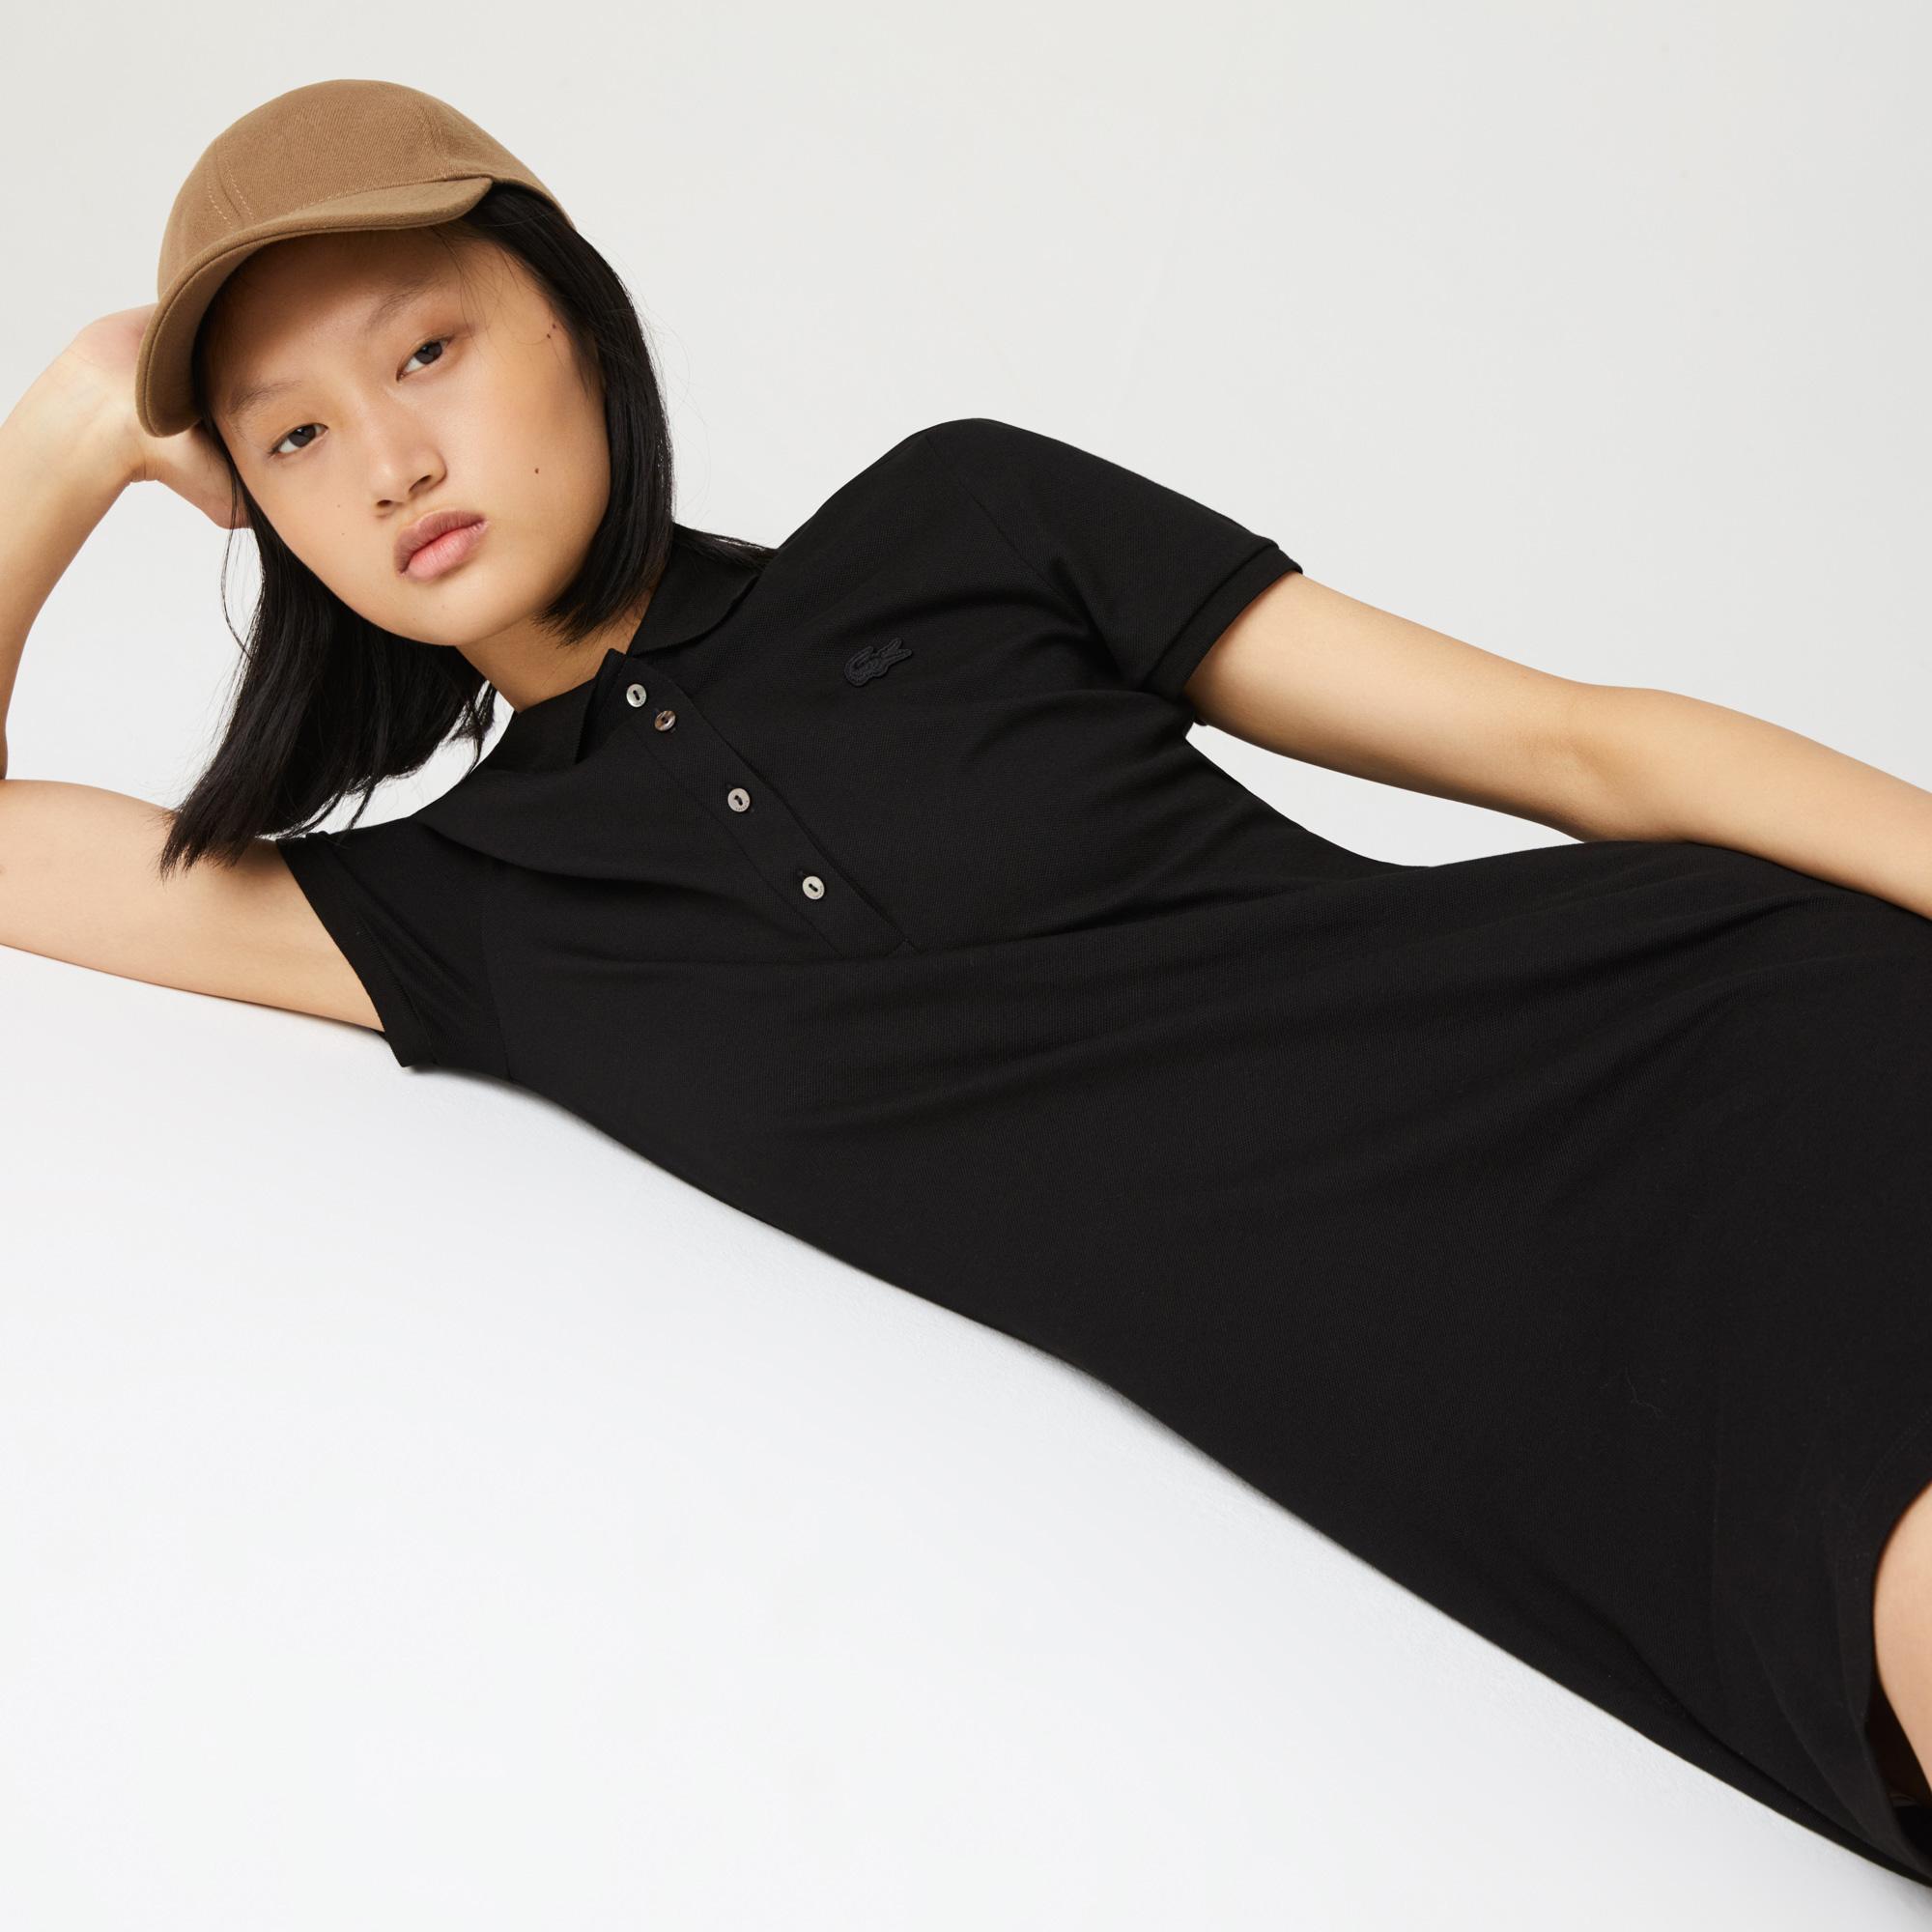 Damen Polokleid Lacoste Women Stretch Cotton Piqué Polo Dress Black EF5473-031